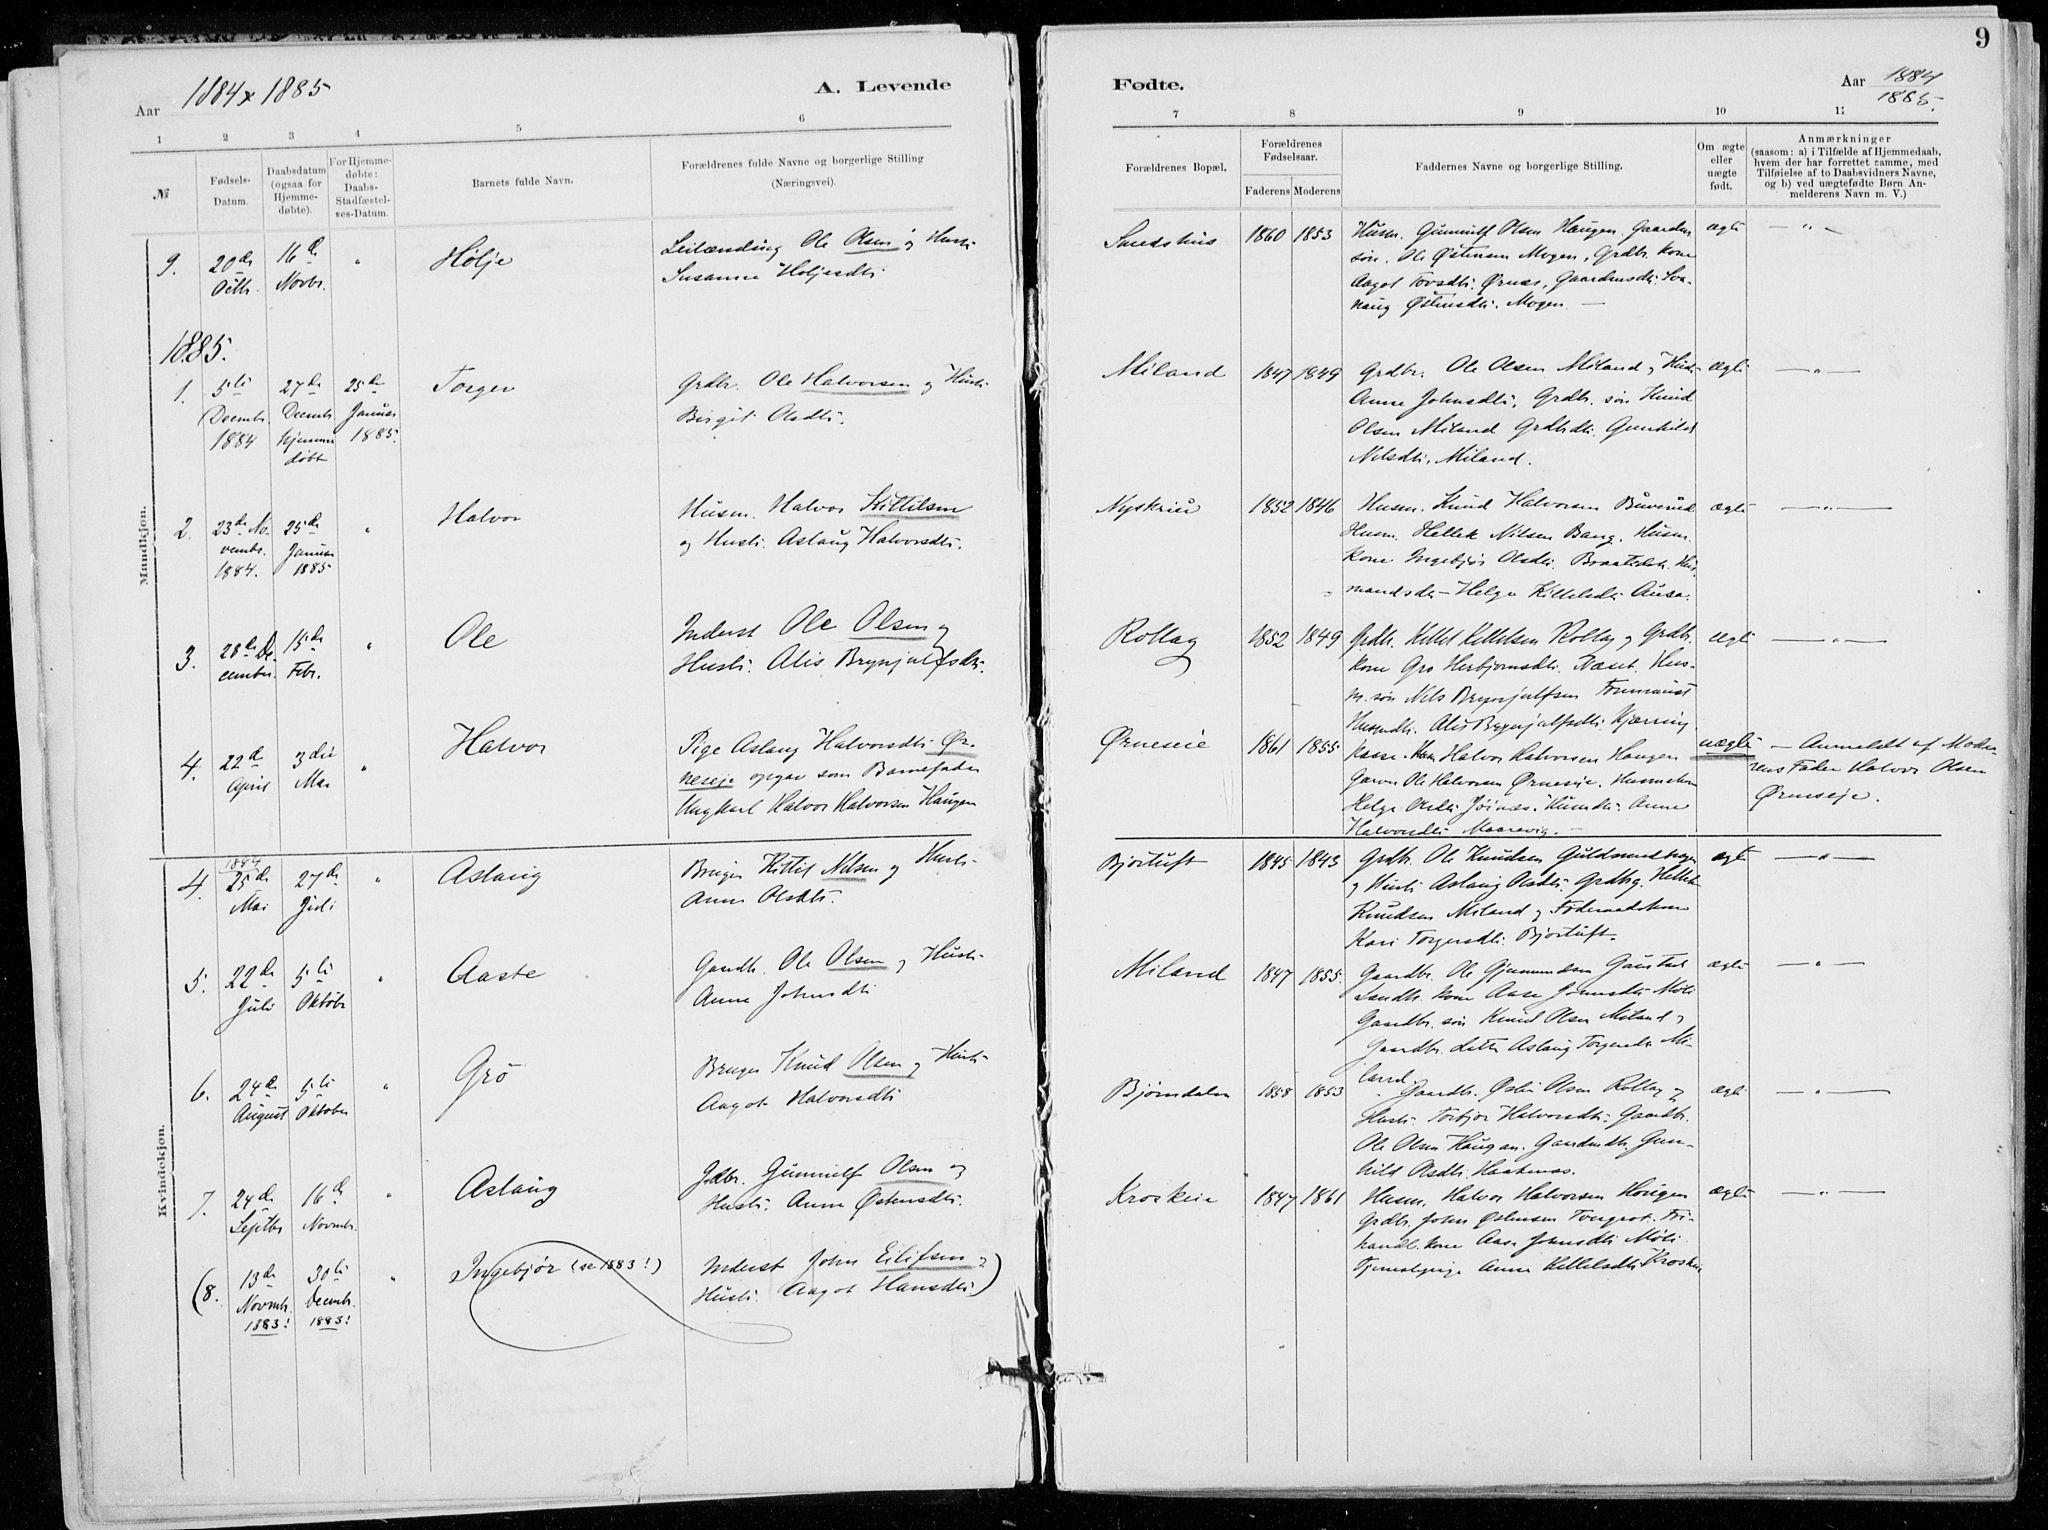 SAKO, Tinn kirkebøker, F/Fb/L0002: Ministerialbok nr. II 2, 1878-1917, s. 9